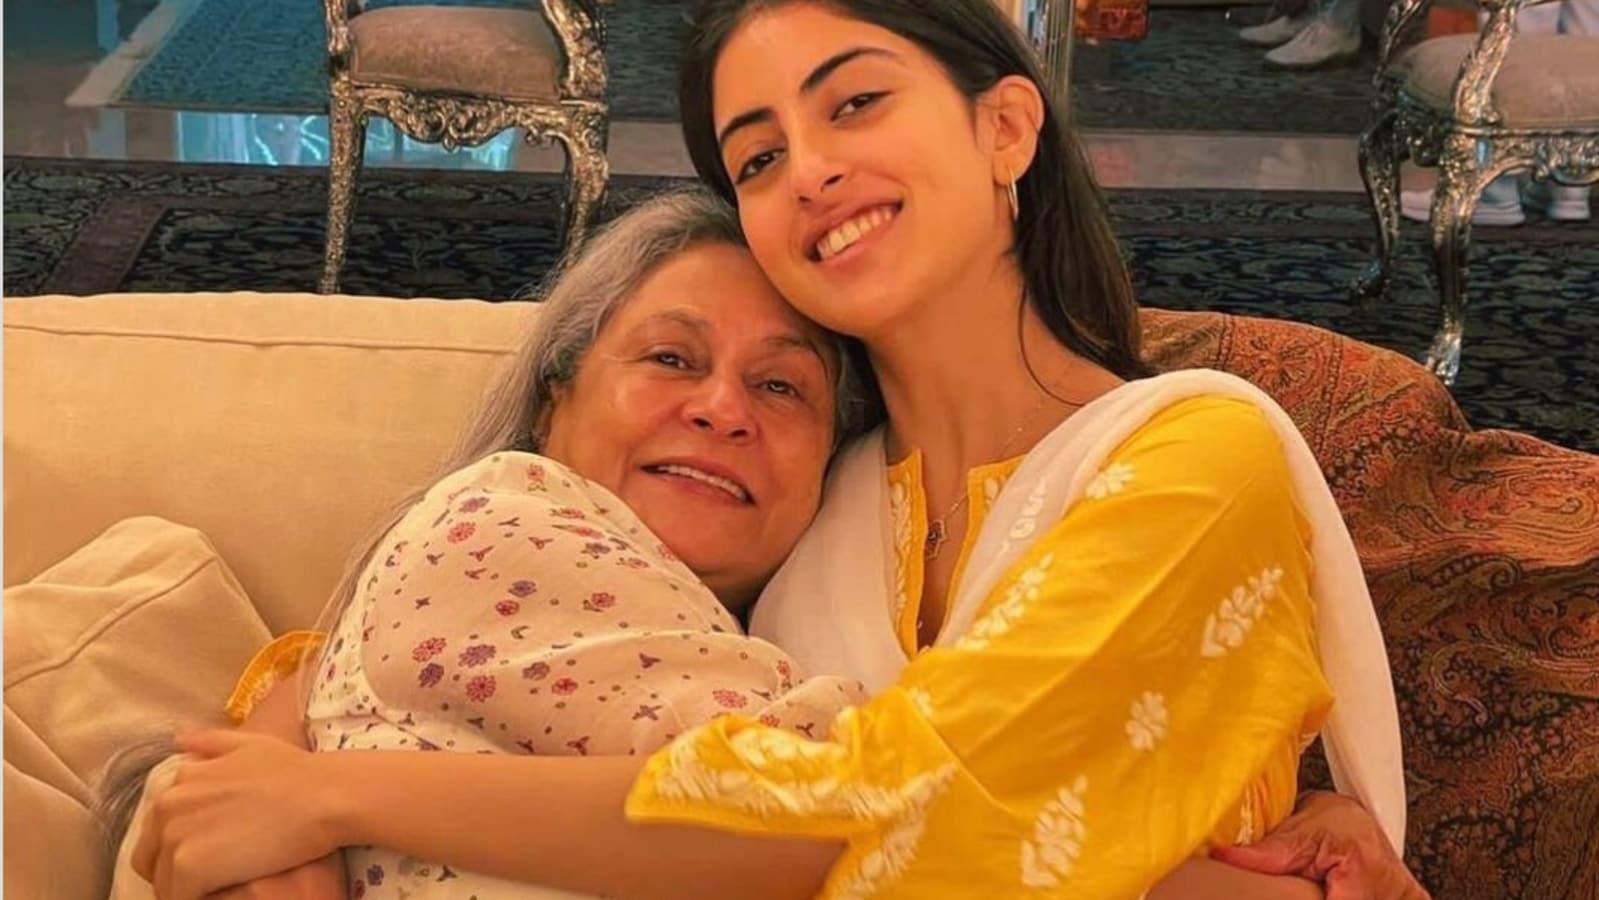 Navya Naveli Nanda shares pic with nani Jaya Bachchan, fan wants to know if chairs behind them are real silver - Hindustan Times